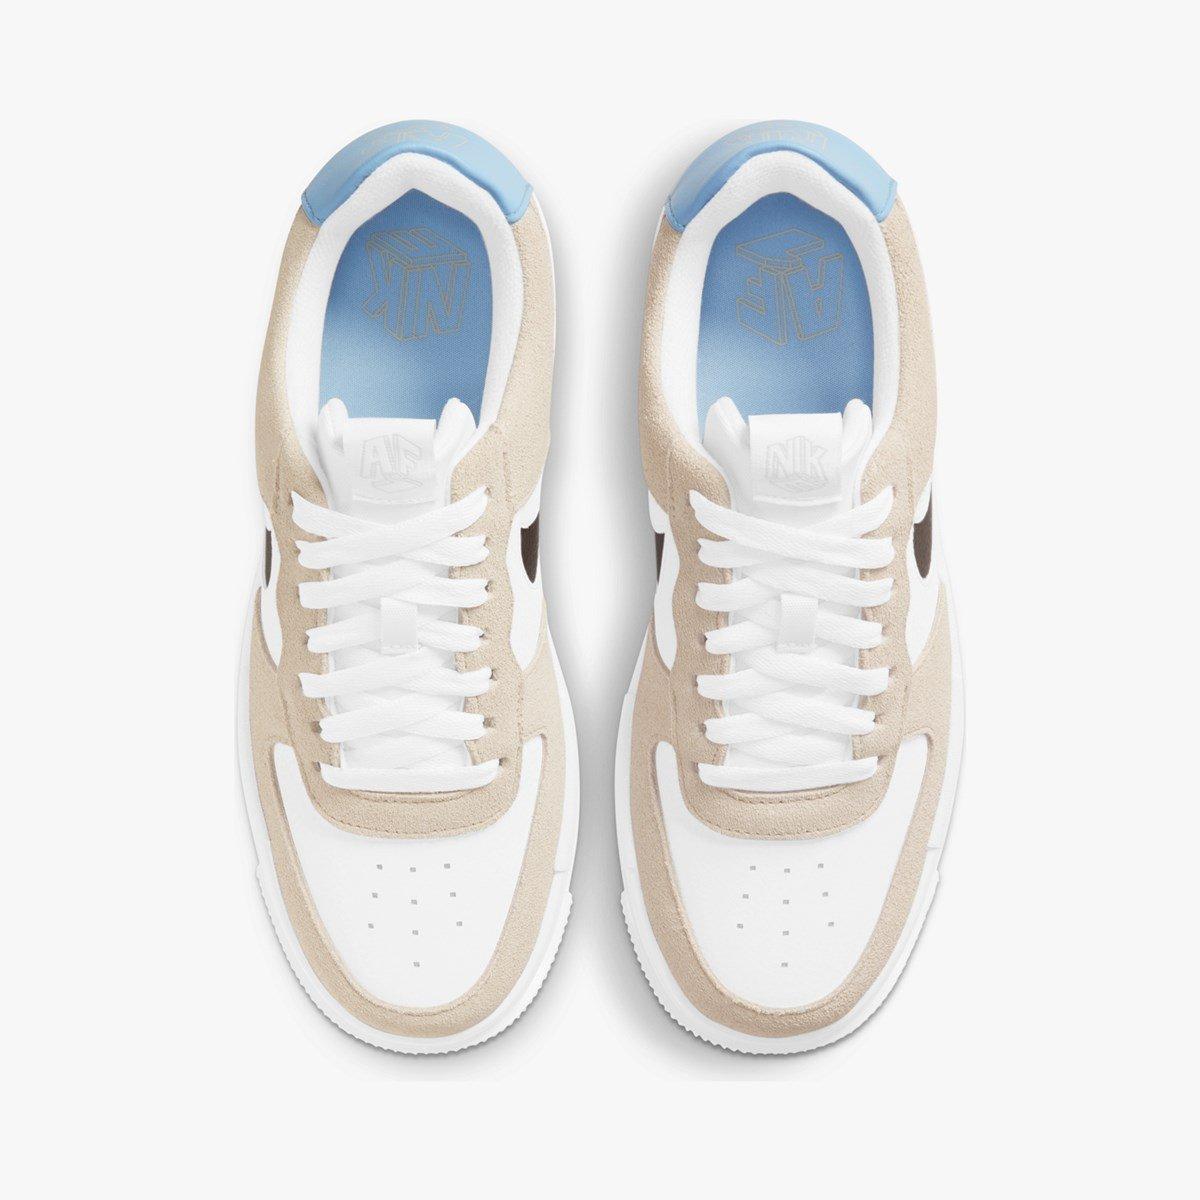 Nike Wmns Air Force 1 Pixel - Dh3861-001 - SNS   sneakers & streetwear en ligne depuis 1999